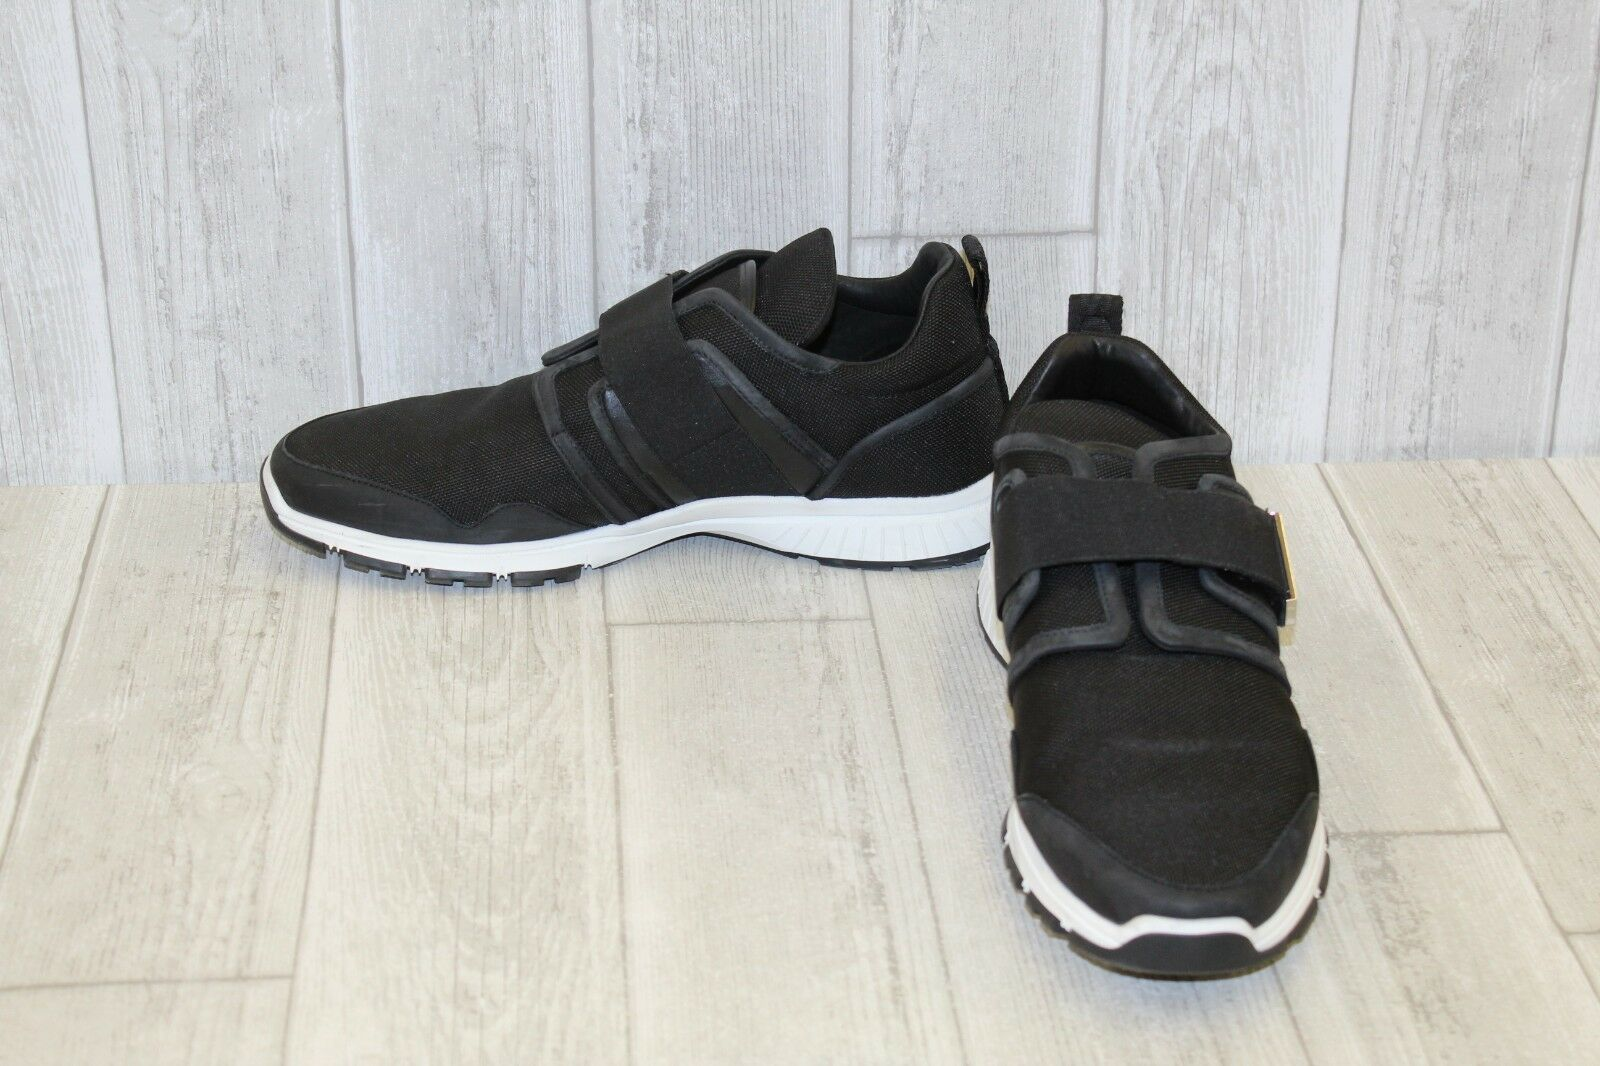 Dsquared2 Marte Run Sneakers - Men's Size 10.5 - Black